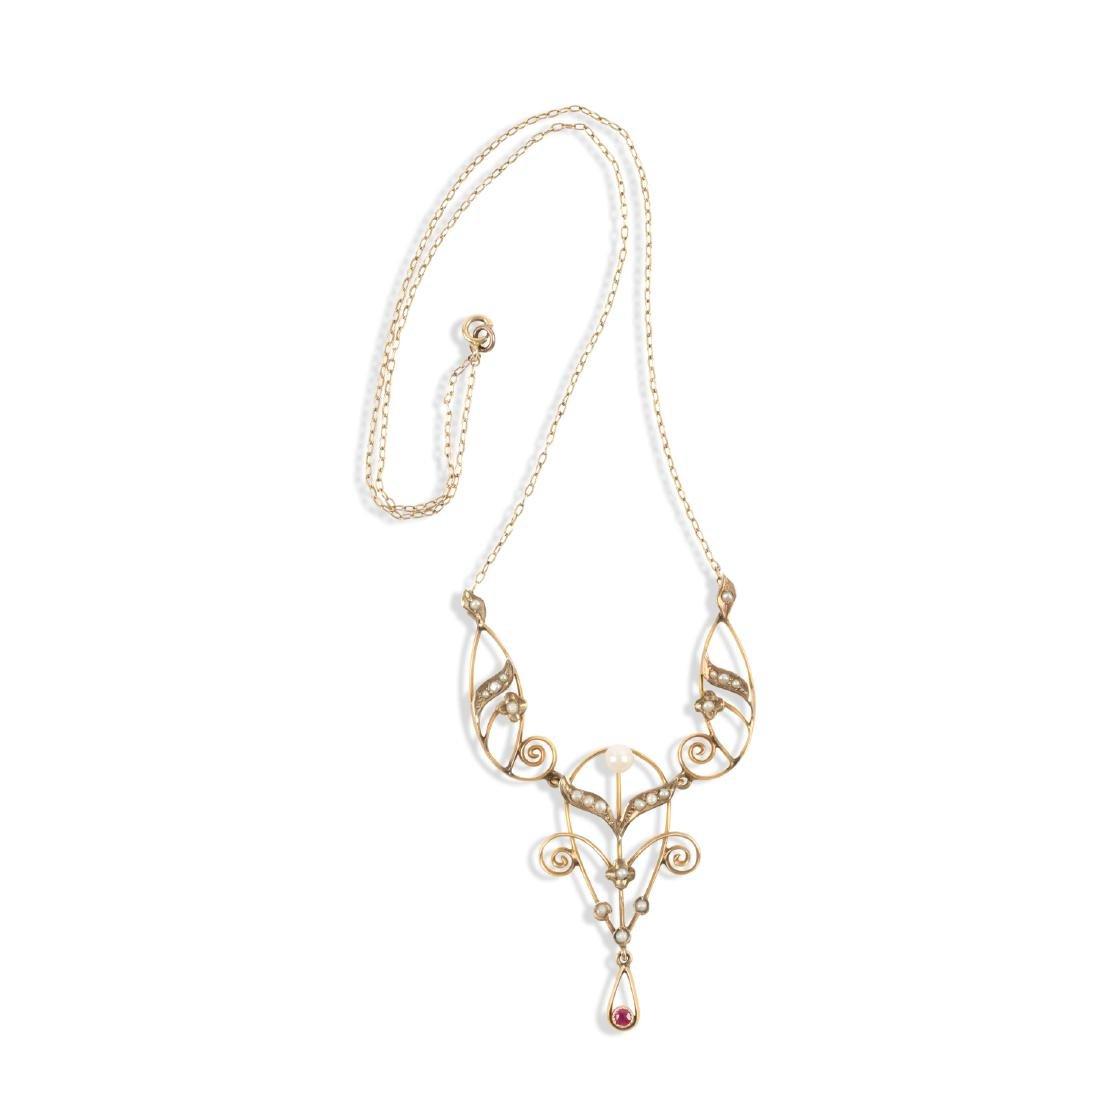 An Edwardian 10K, Pearl & Tourmaline Necklace